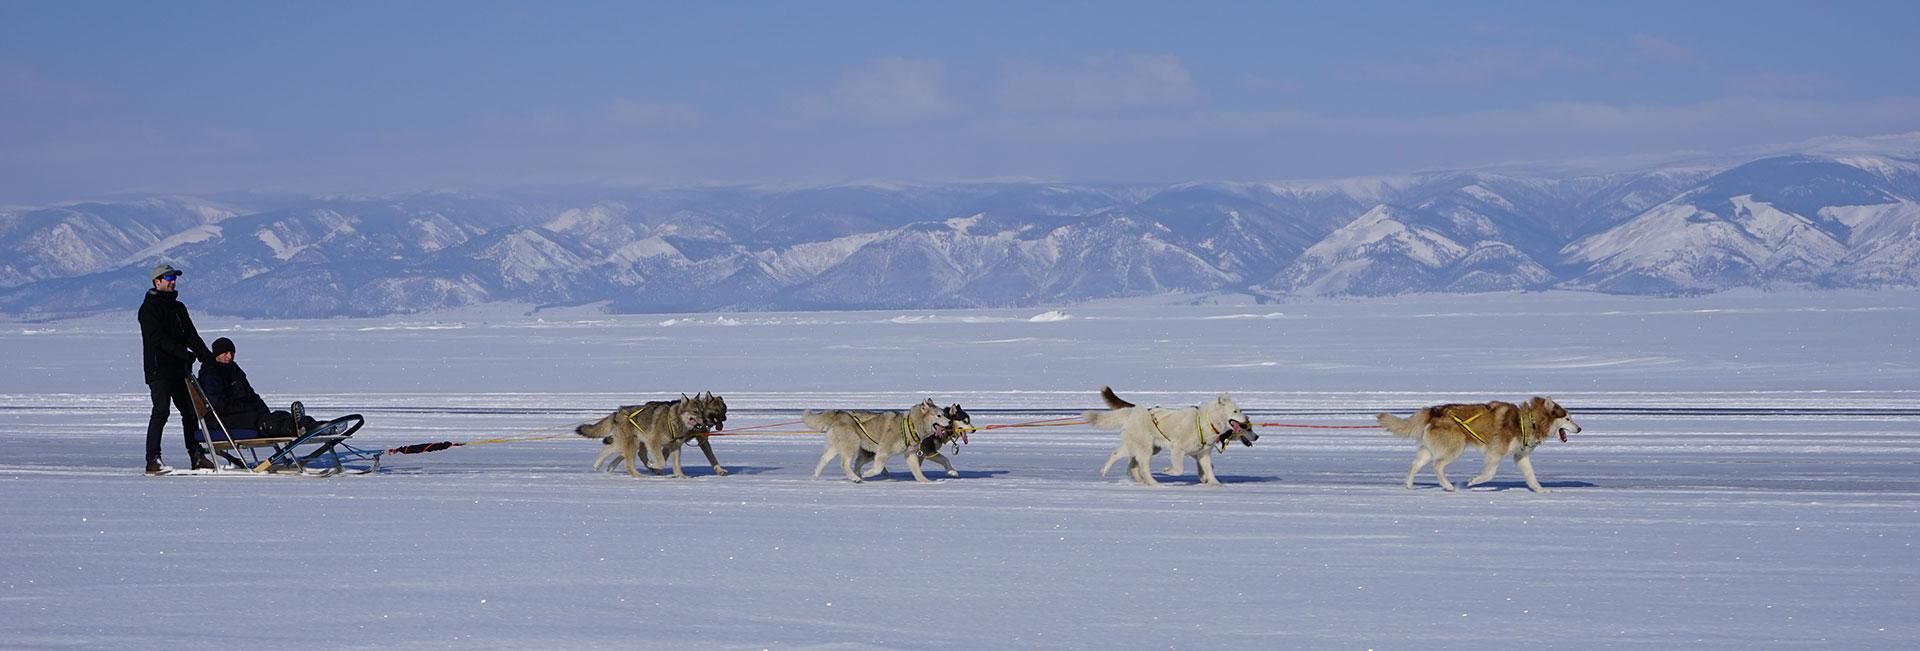 Traveling over Lake Baikal by dog sled. Photo credit: Vladimir Kvashnin